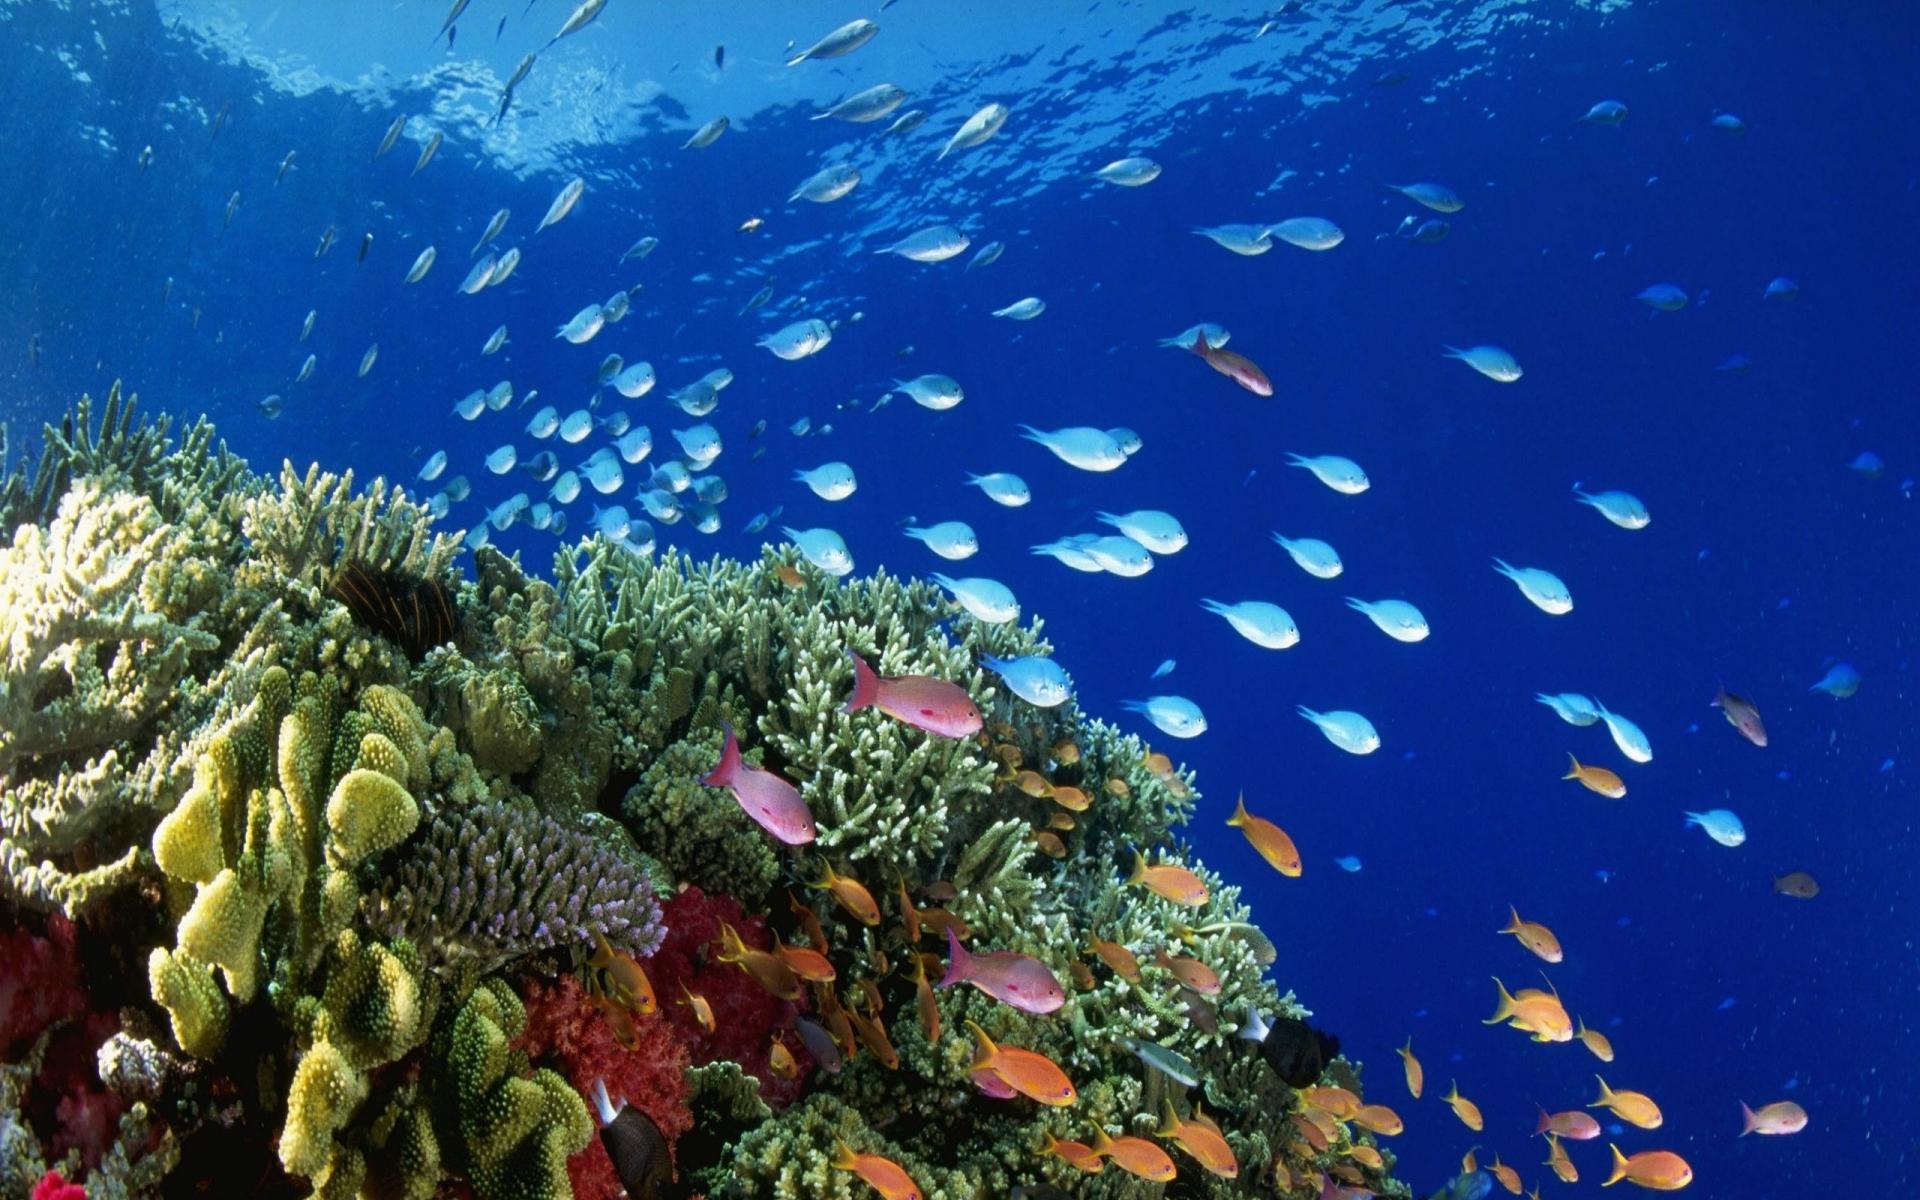 underwater coral reef 2560x2048 wallpaper Art HD Wallpaper download 1920x1200